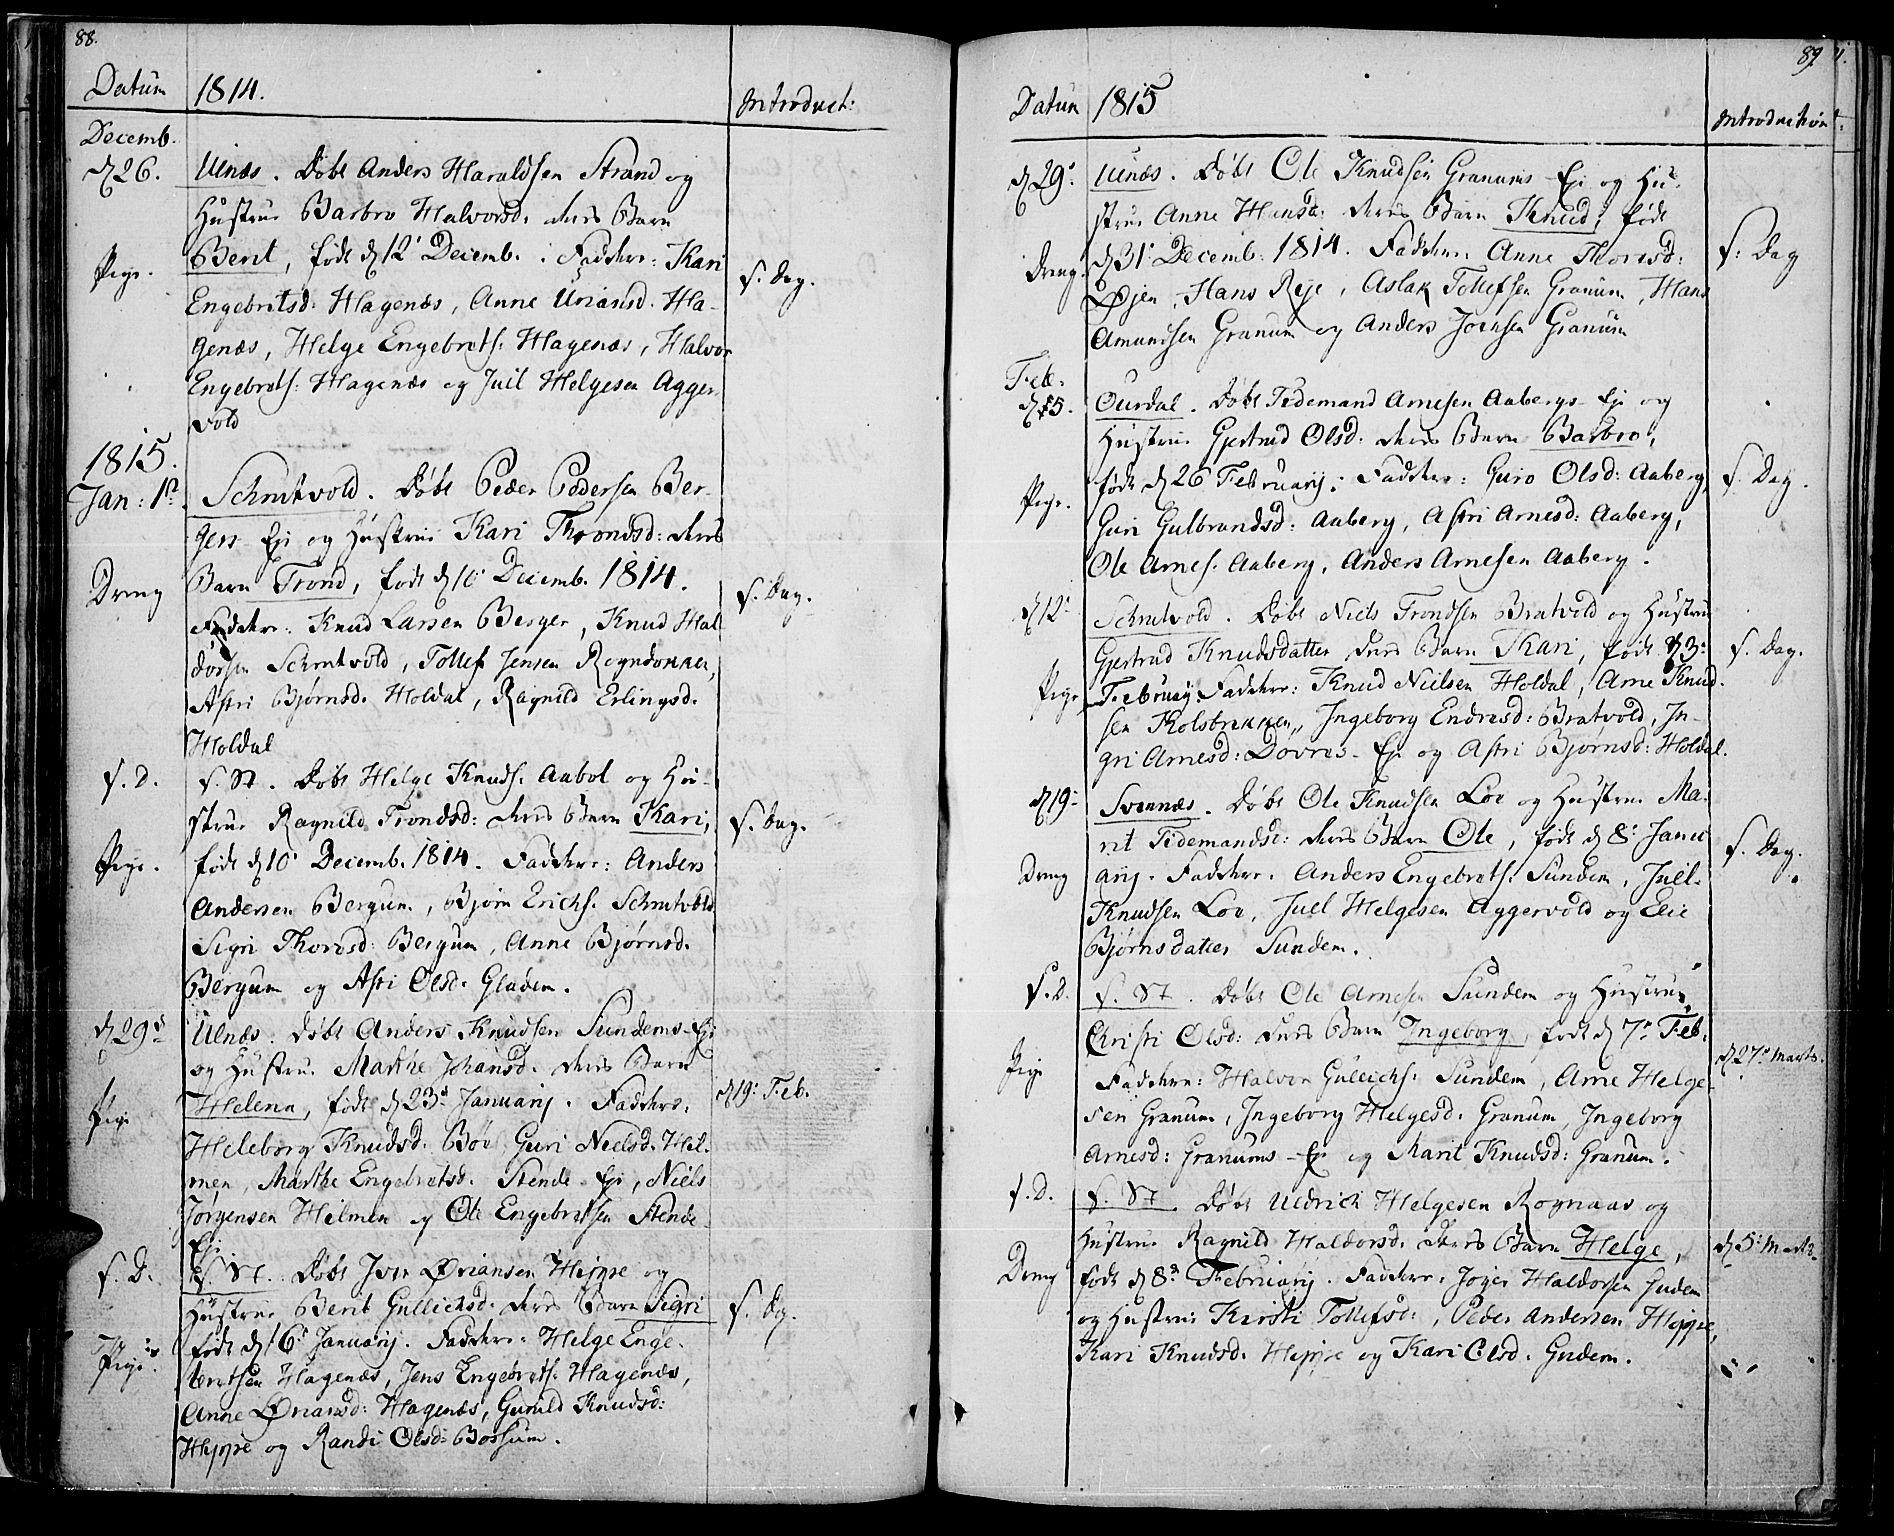 SAH, Nord-Aurdal prestekontor, Ministerialbok nr. 1, 1808-1815, s. 88-89